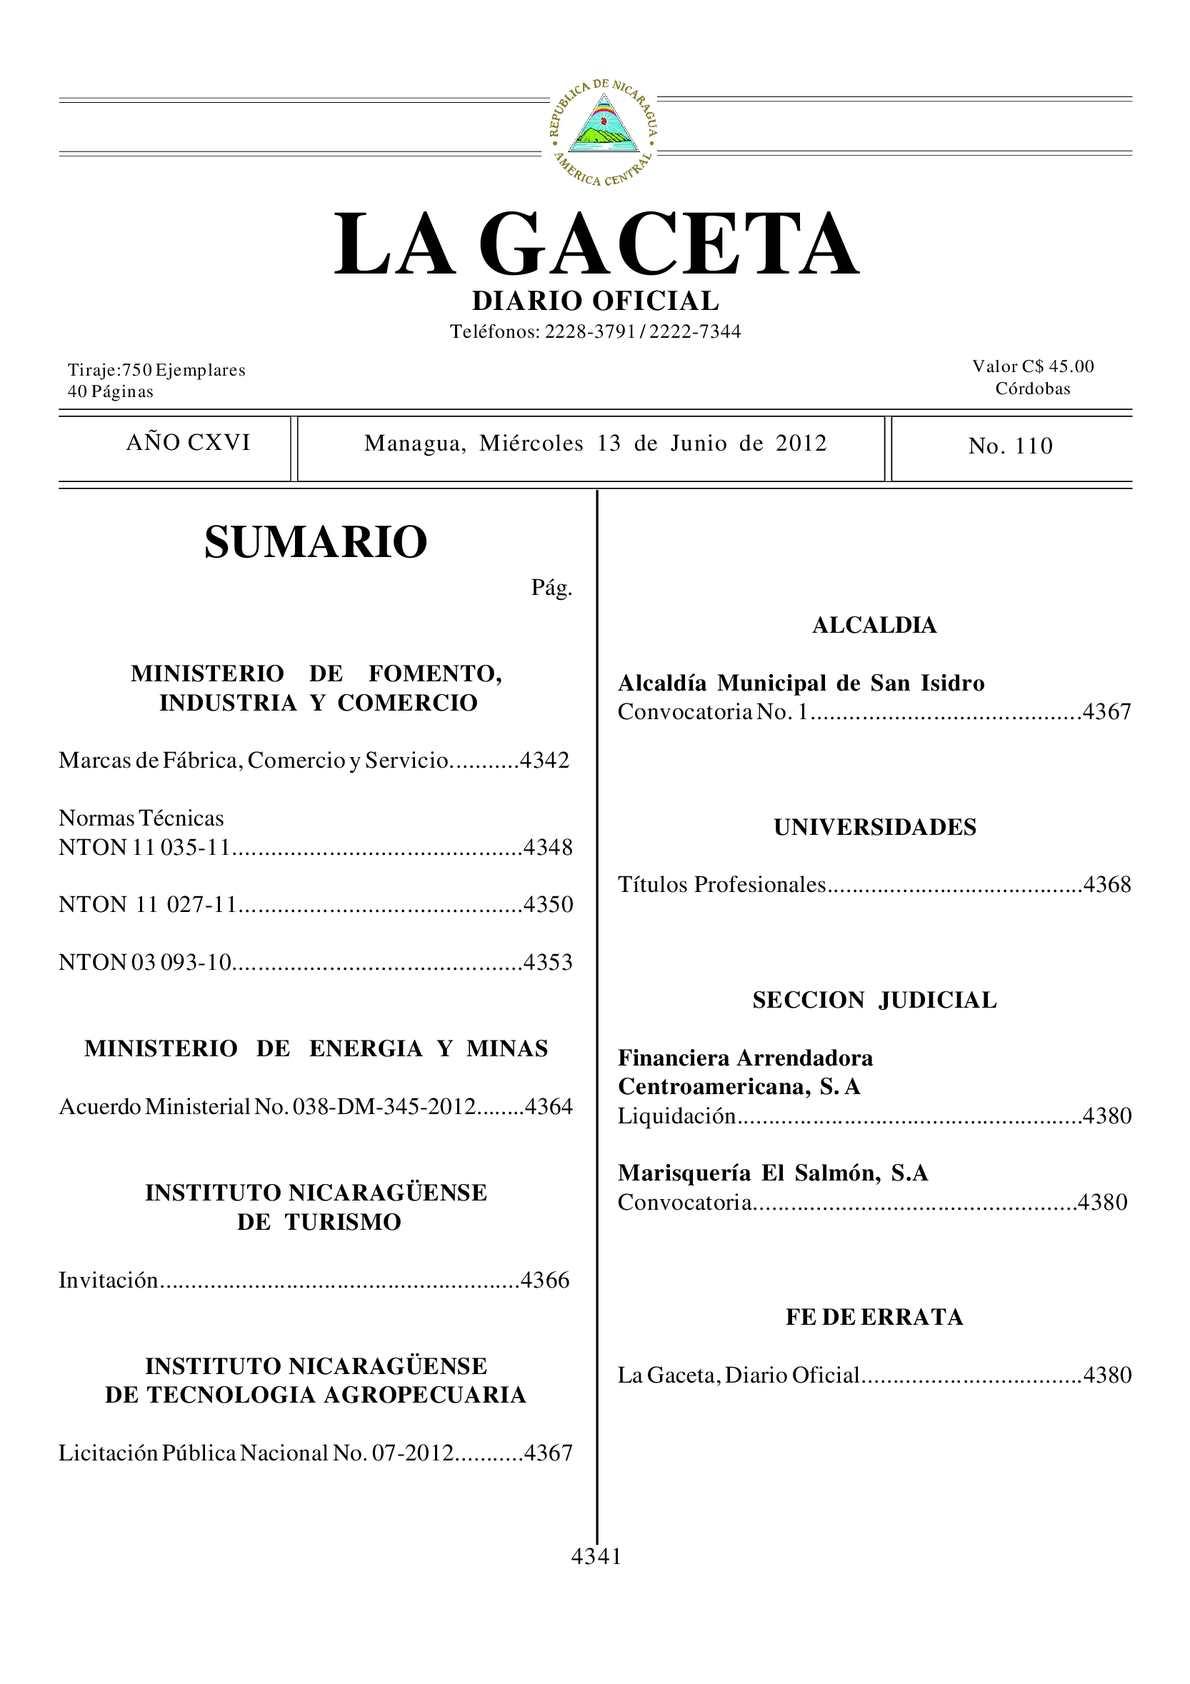 110 Gaceta, Miercoles 13 De Junio 2012